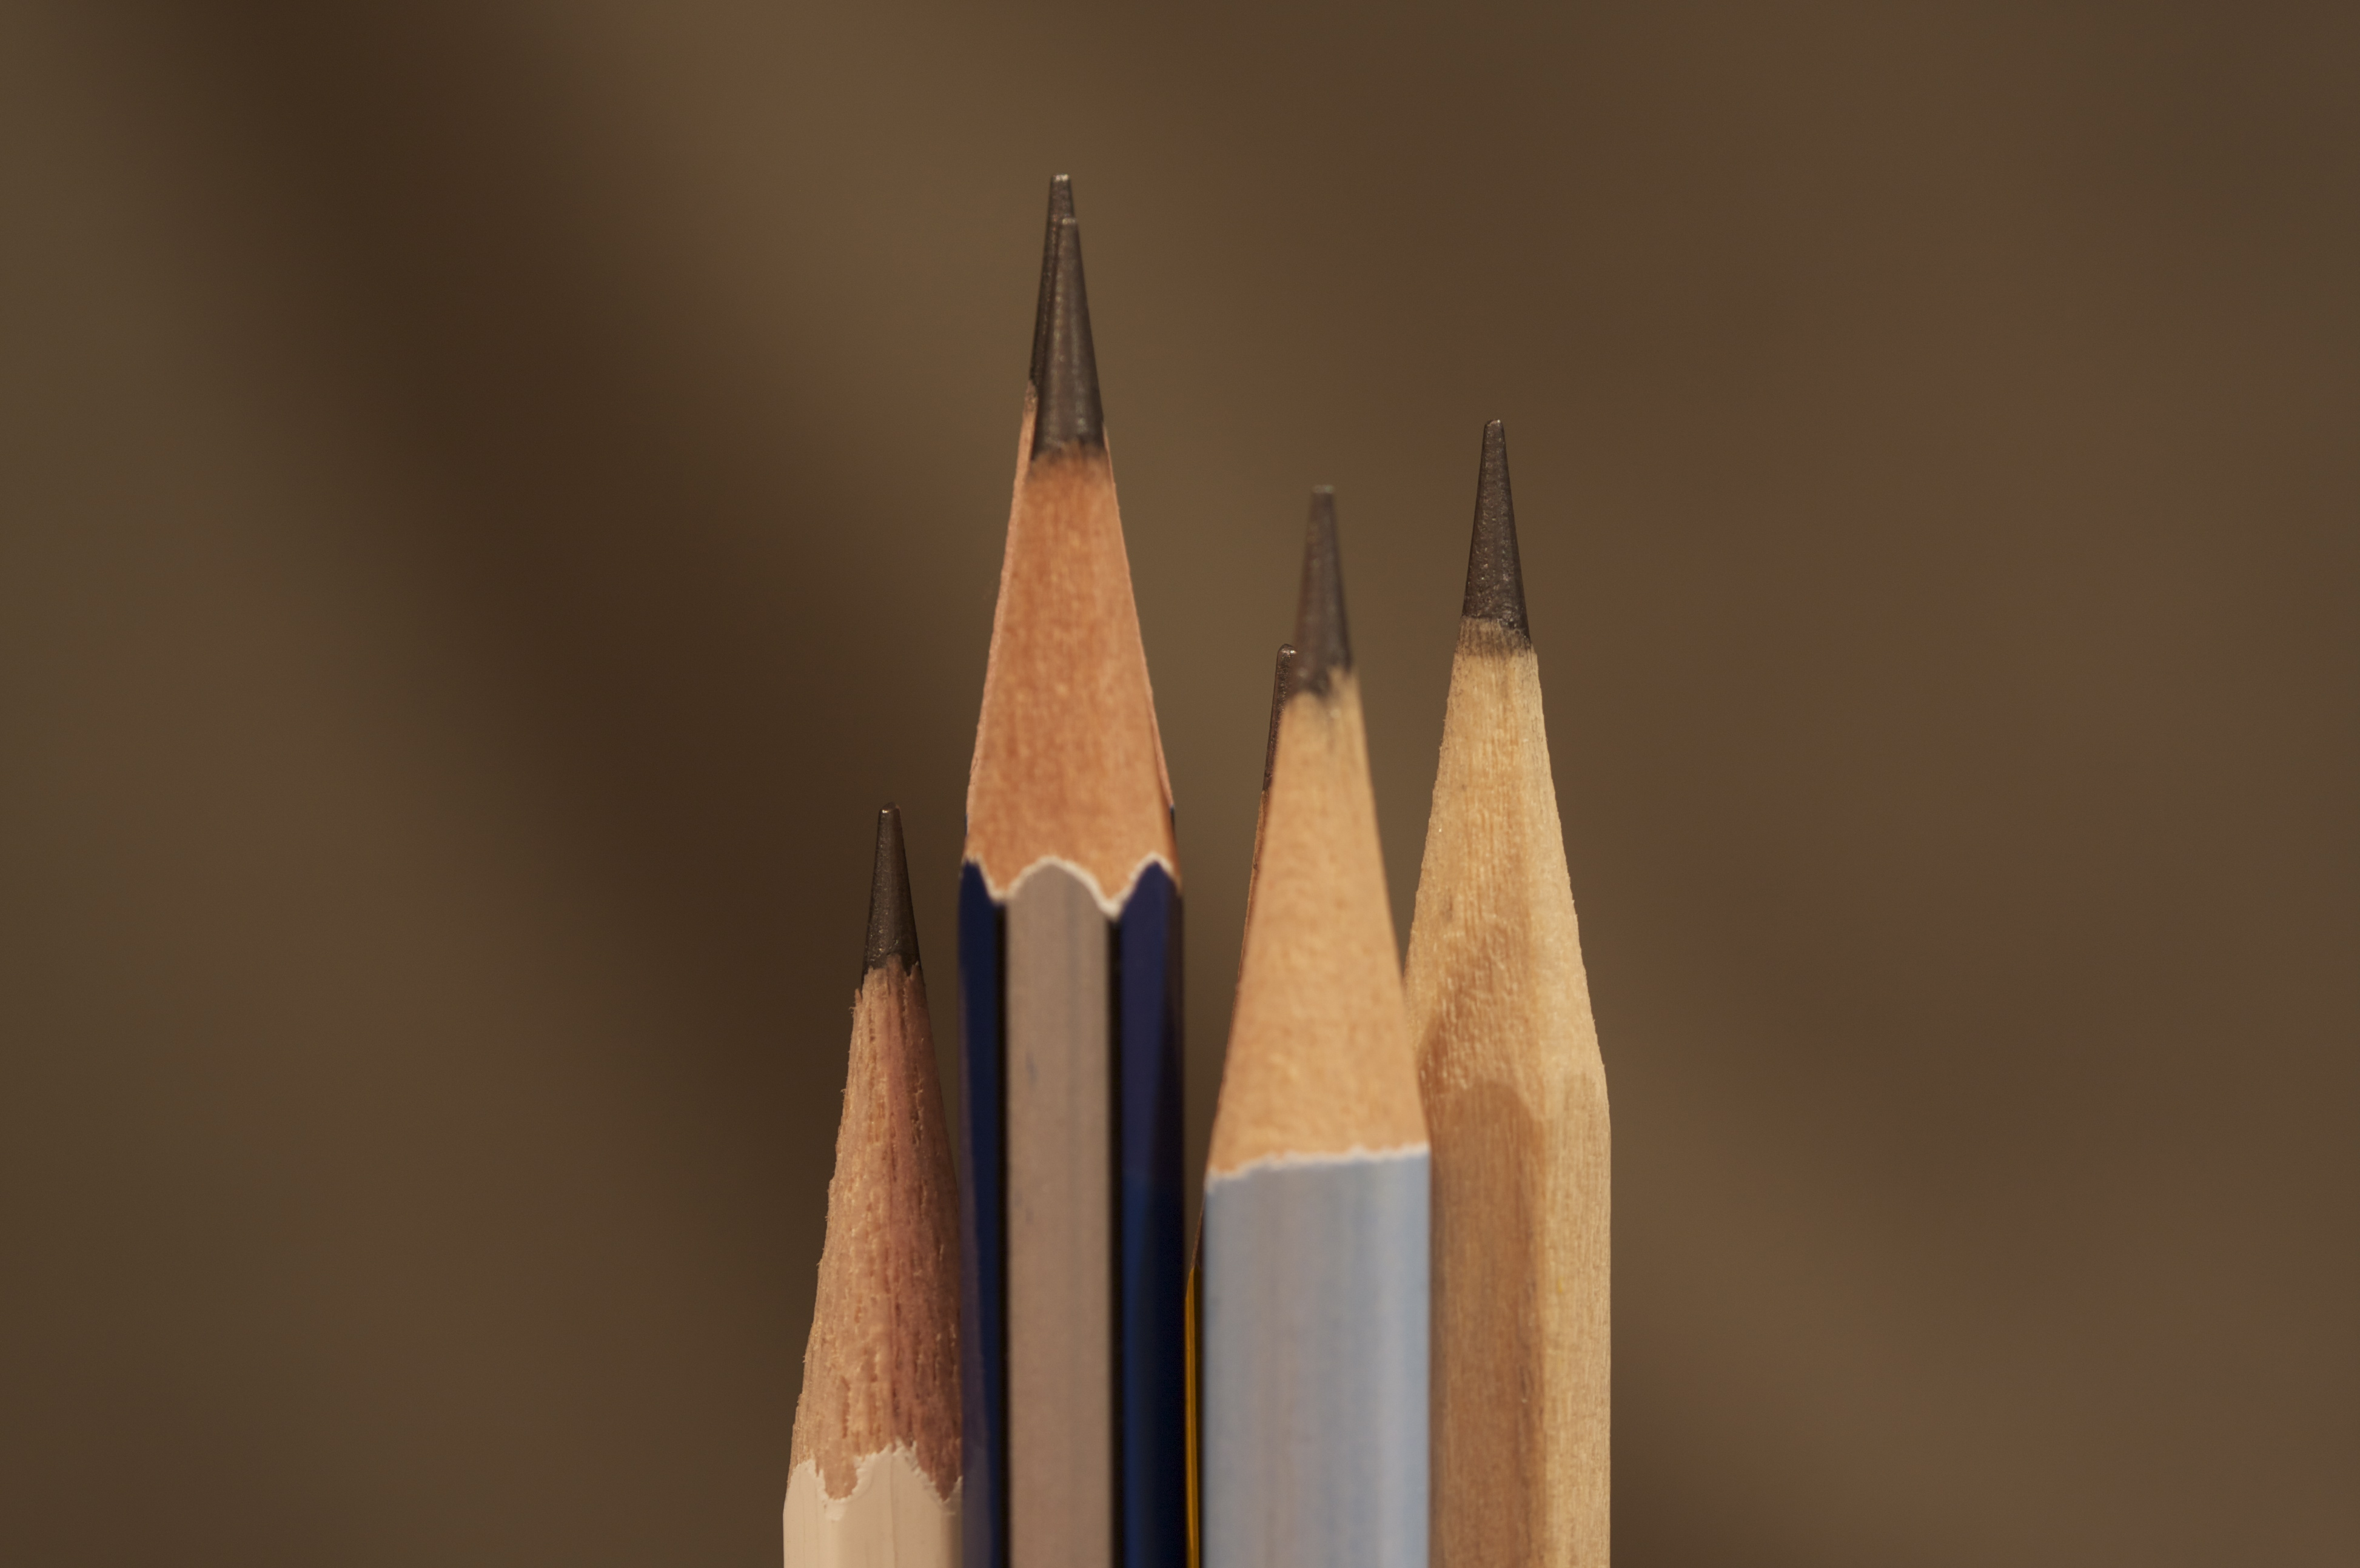 Ordinary everyday used pencils